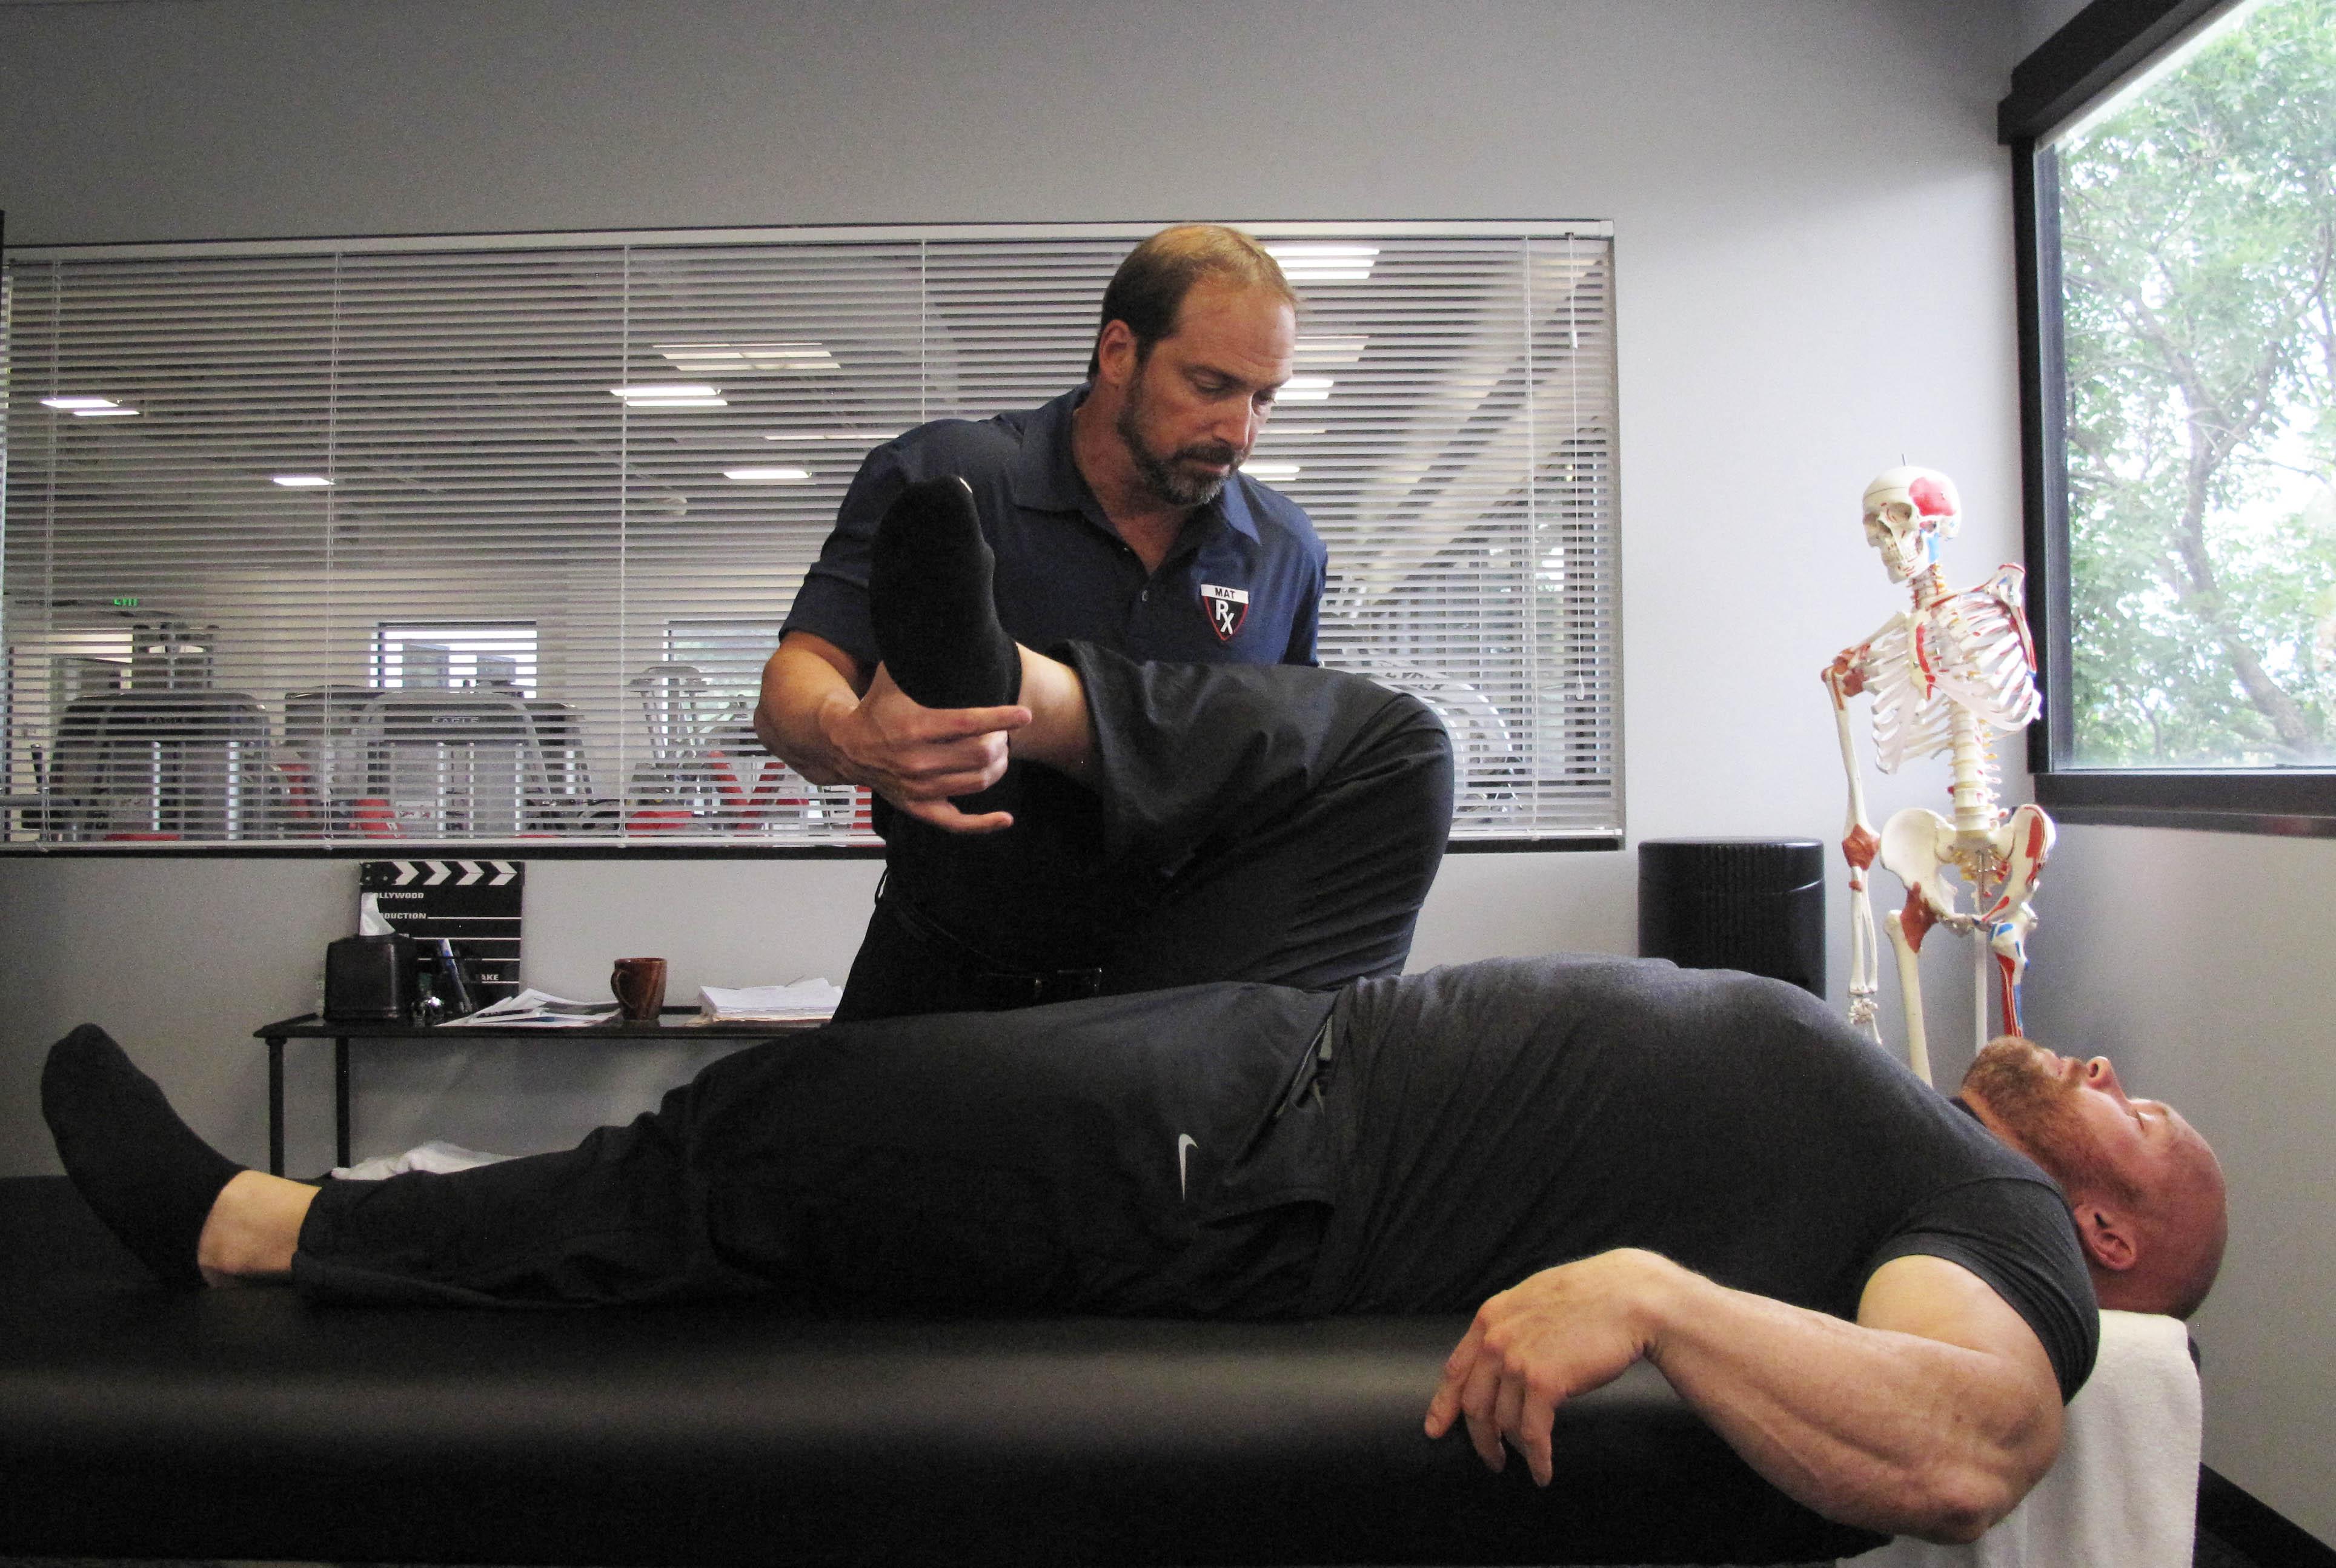 IFBB Pro Ben Pakulski and Greg Roskopf working on knee internal rotation